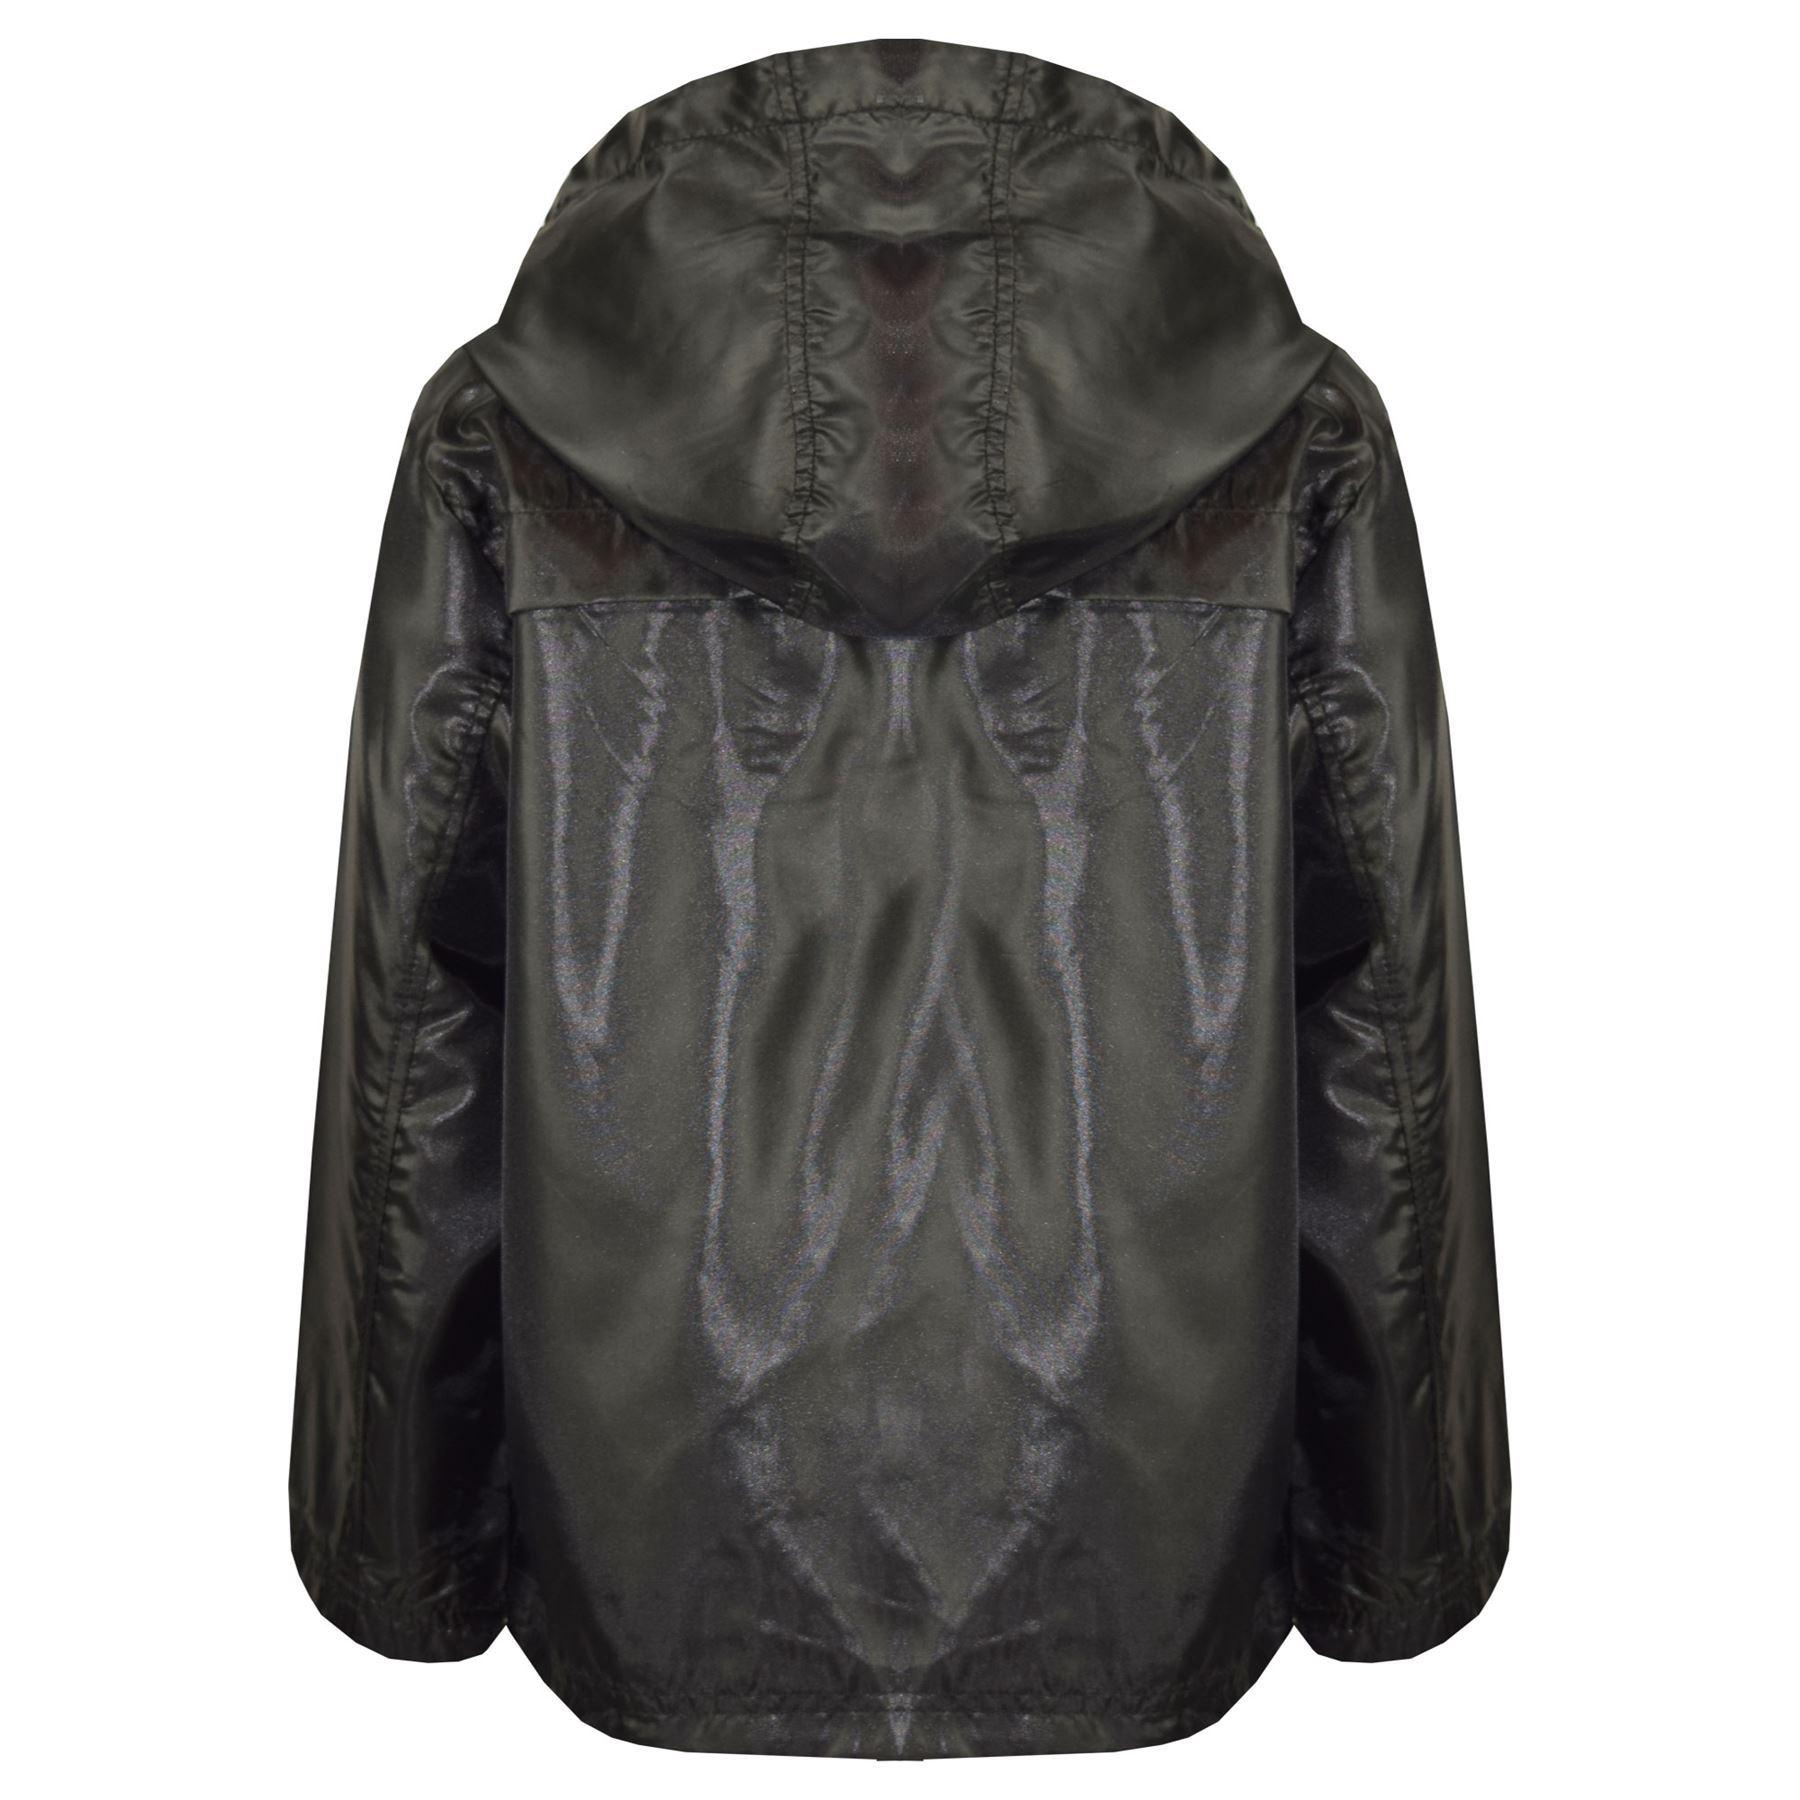 Kids Girls Boys Raincoats Jackets White Lightweight Hooded Cagoule Rain Mac 5-13